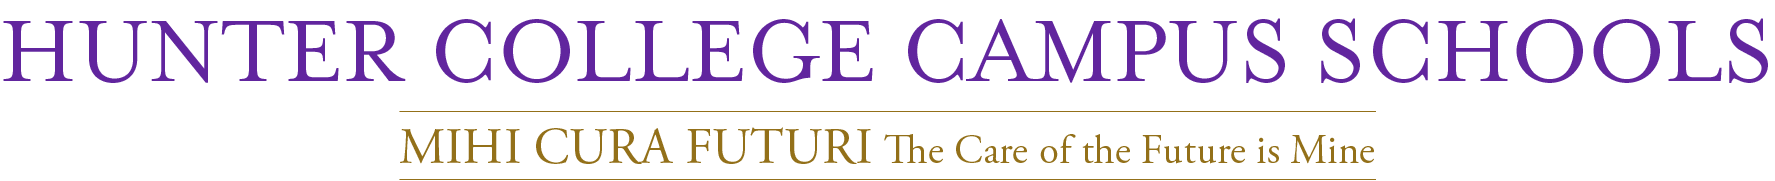 Hunter College Academic Calendar Fall 2022.High School Welcome